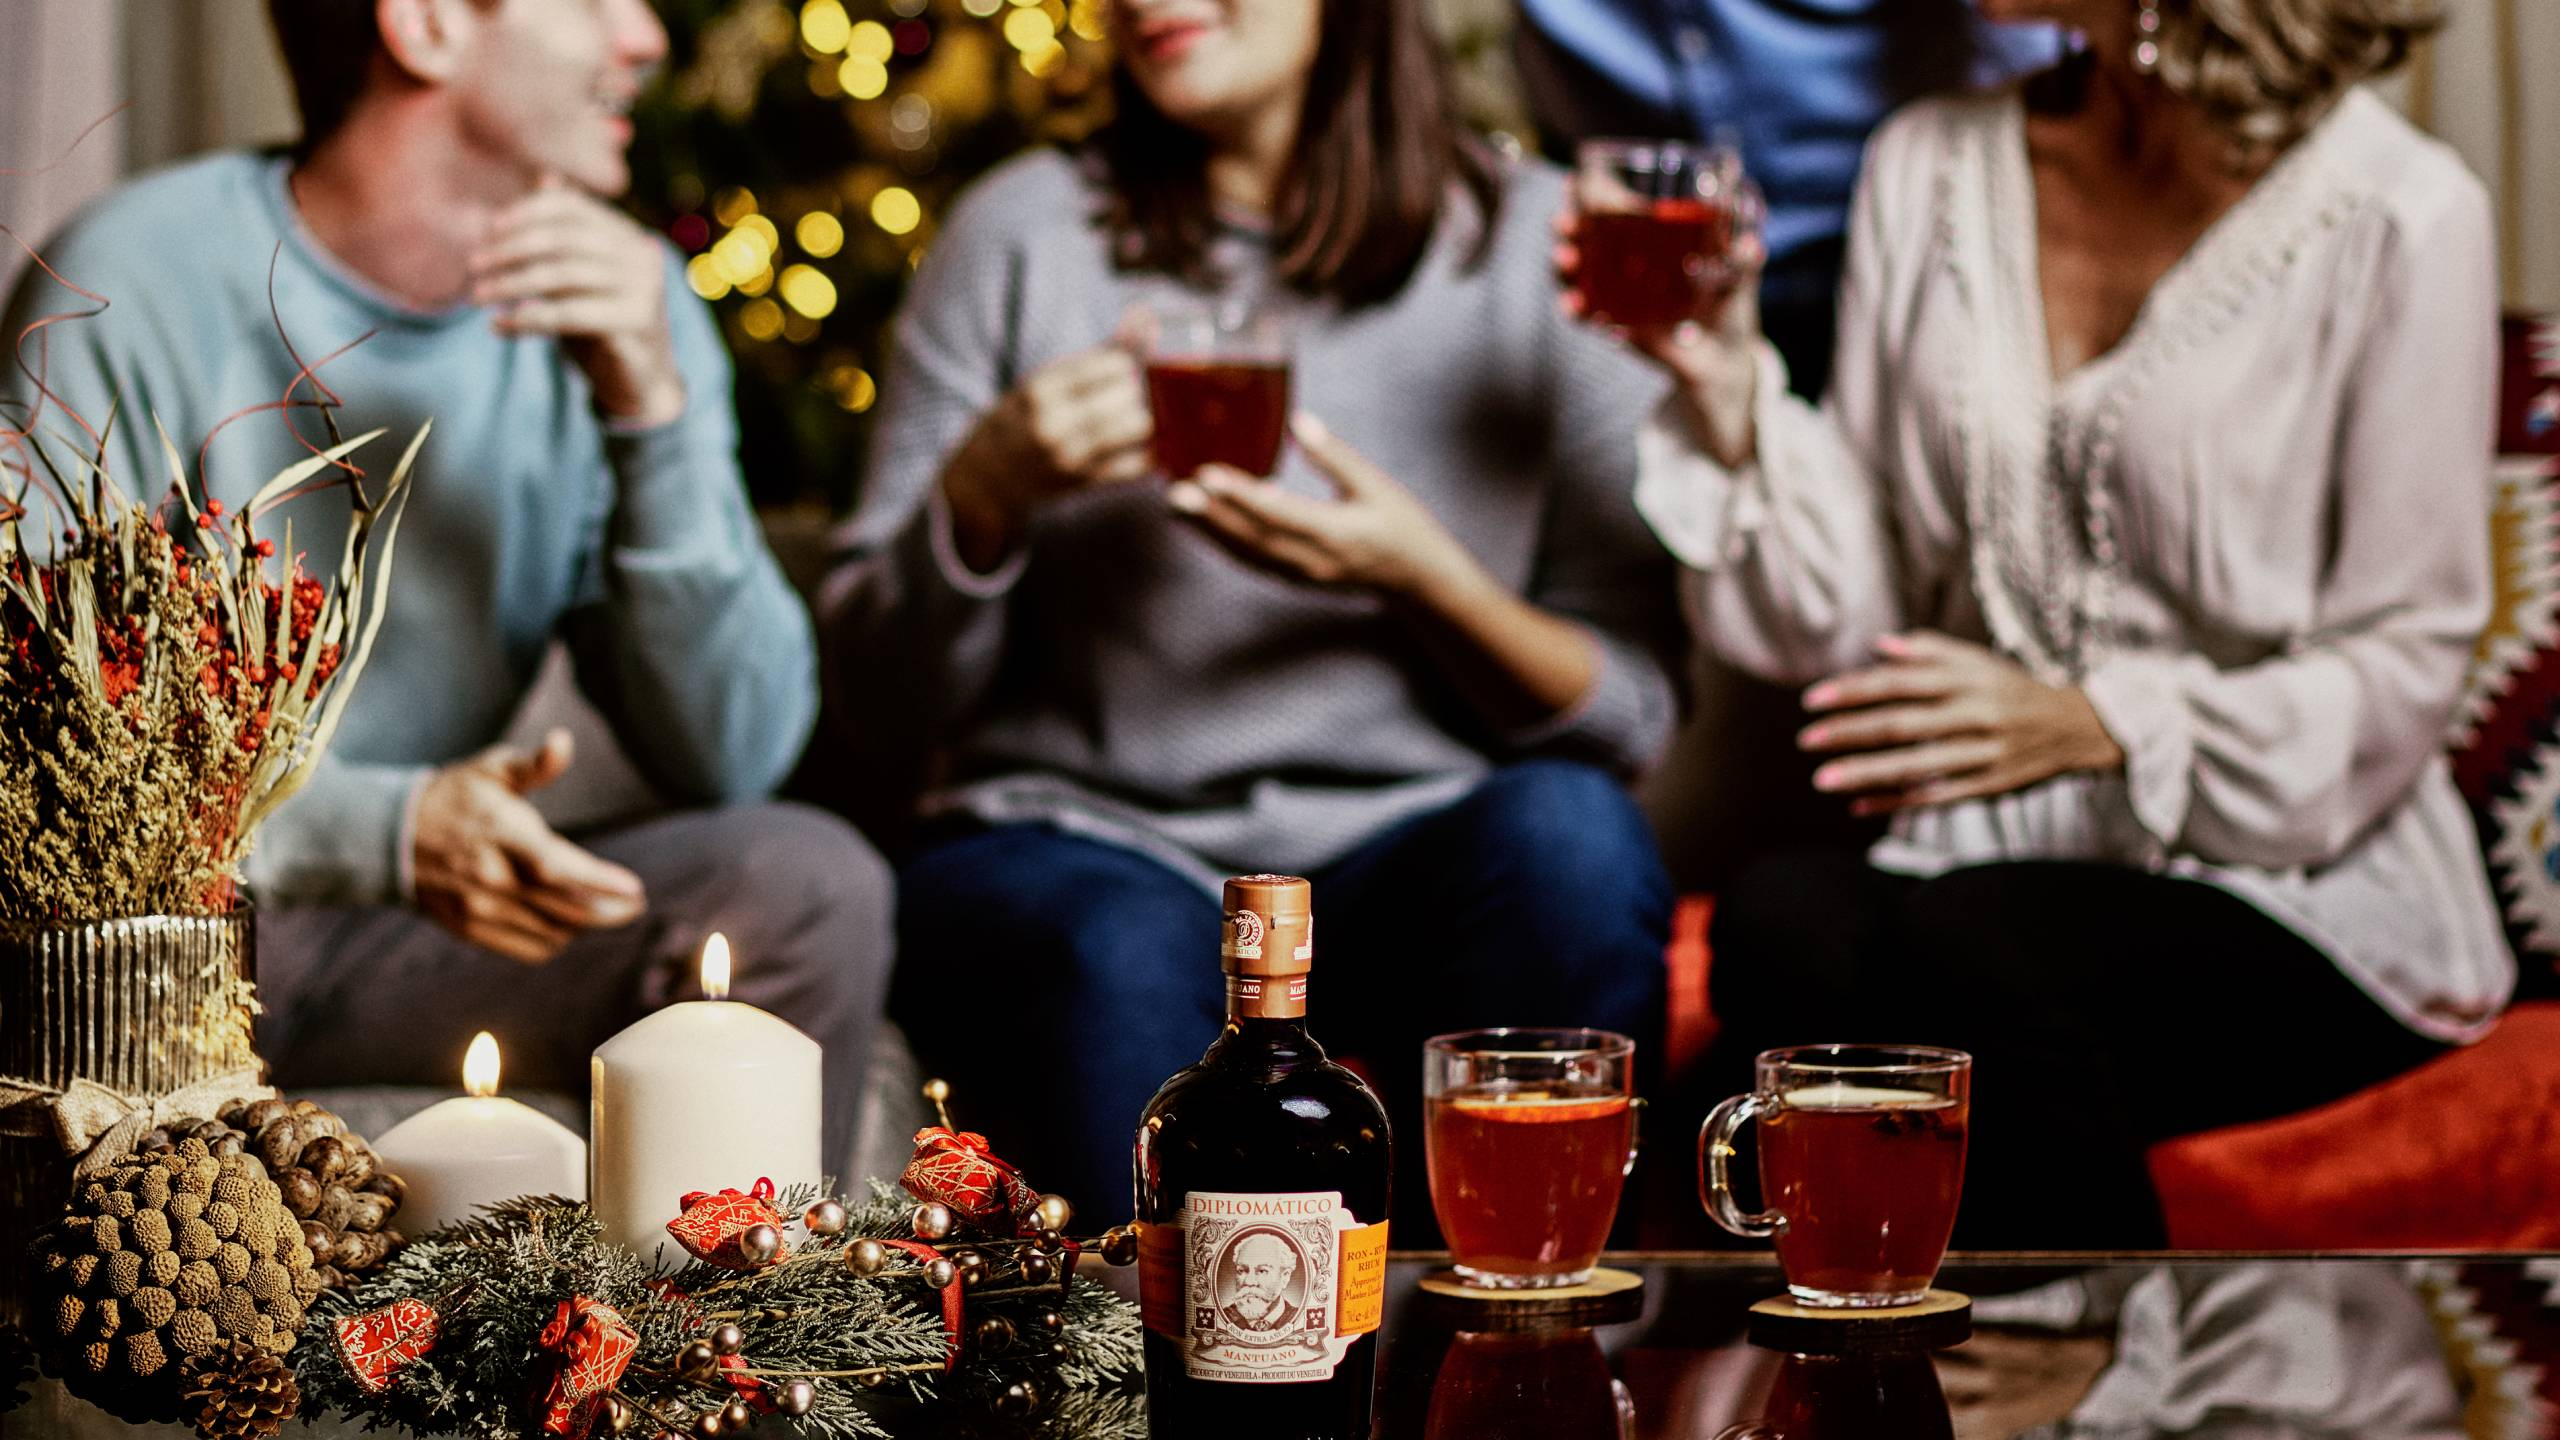 diplo-cares-thanksgivig-diplomatico-rum